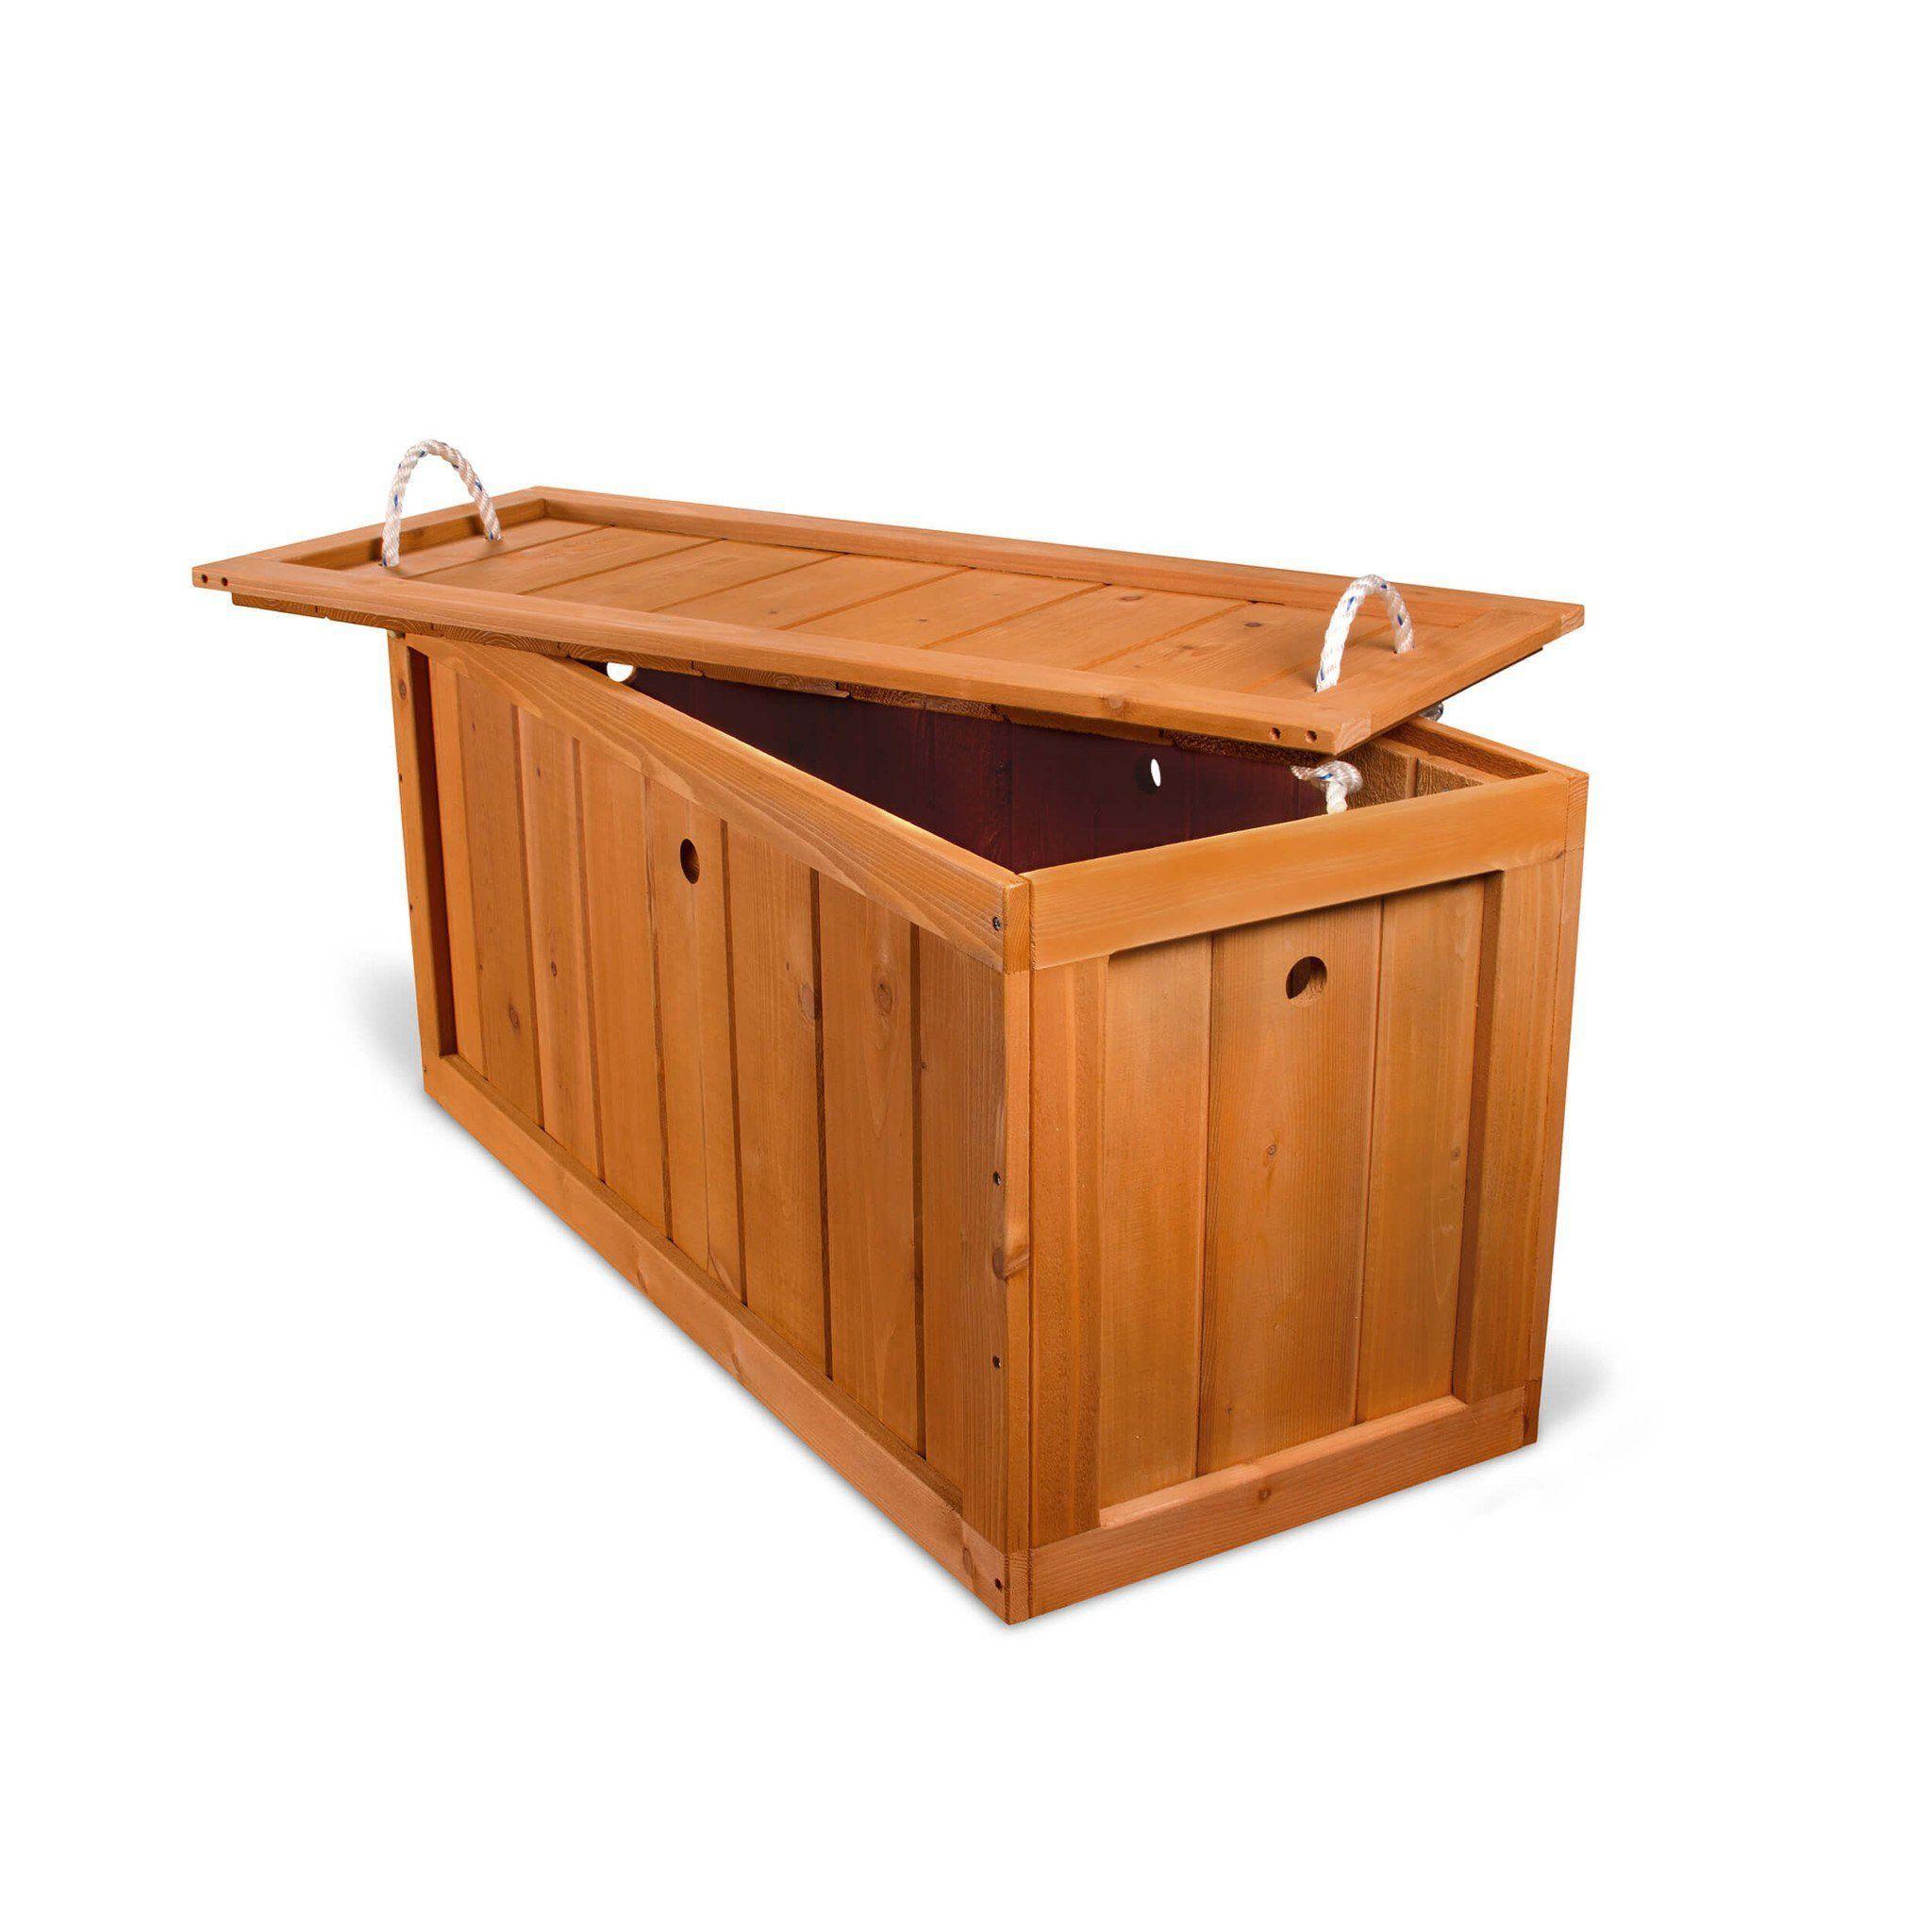 Cedar Toy Chest Wooden toy chest, Wooden toys, Toy chest